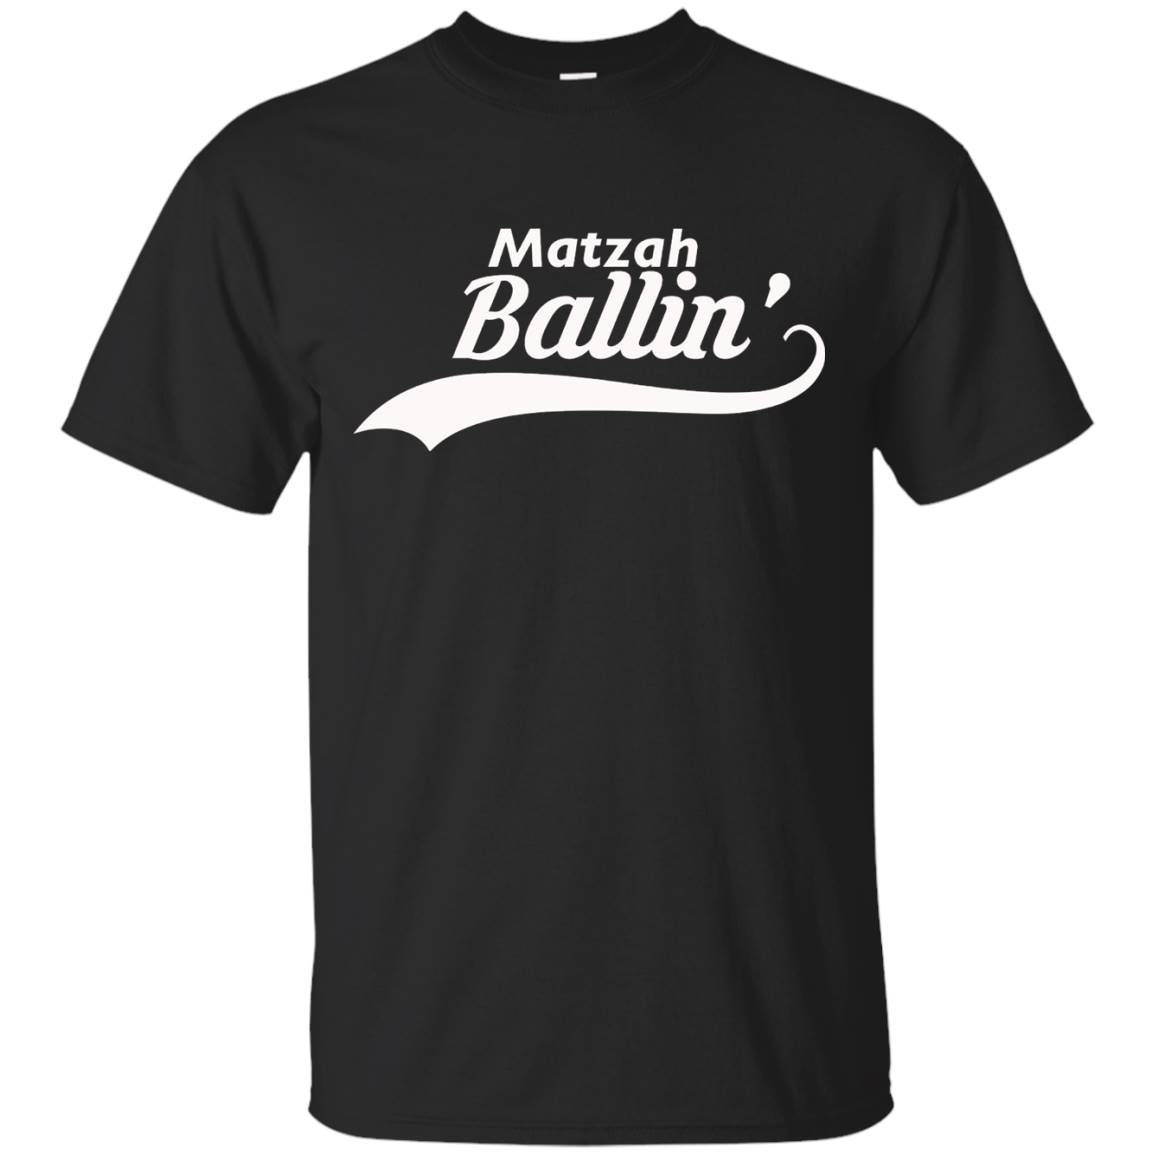 Funny Jewish Hebrew T-Shirt – Matzah Ballin' Passover Tee